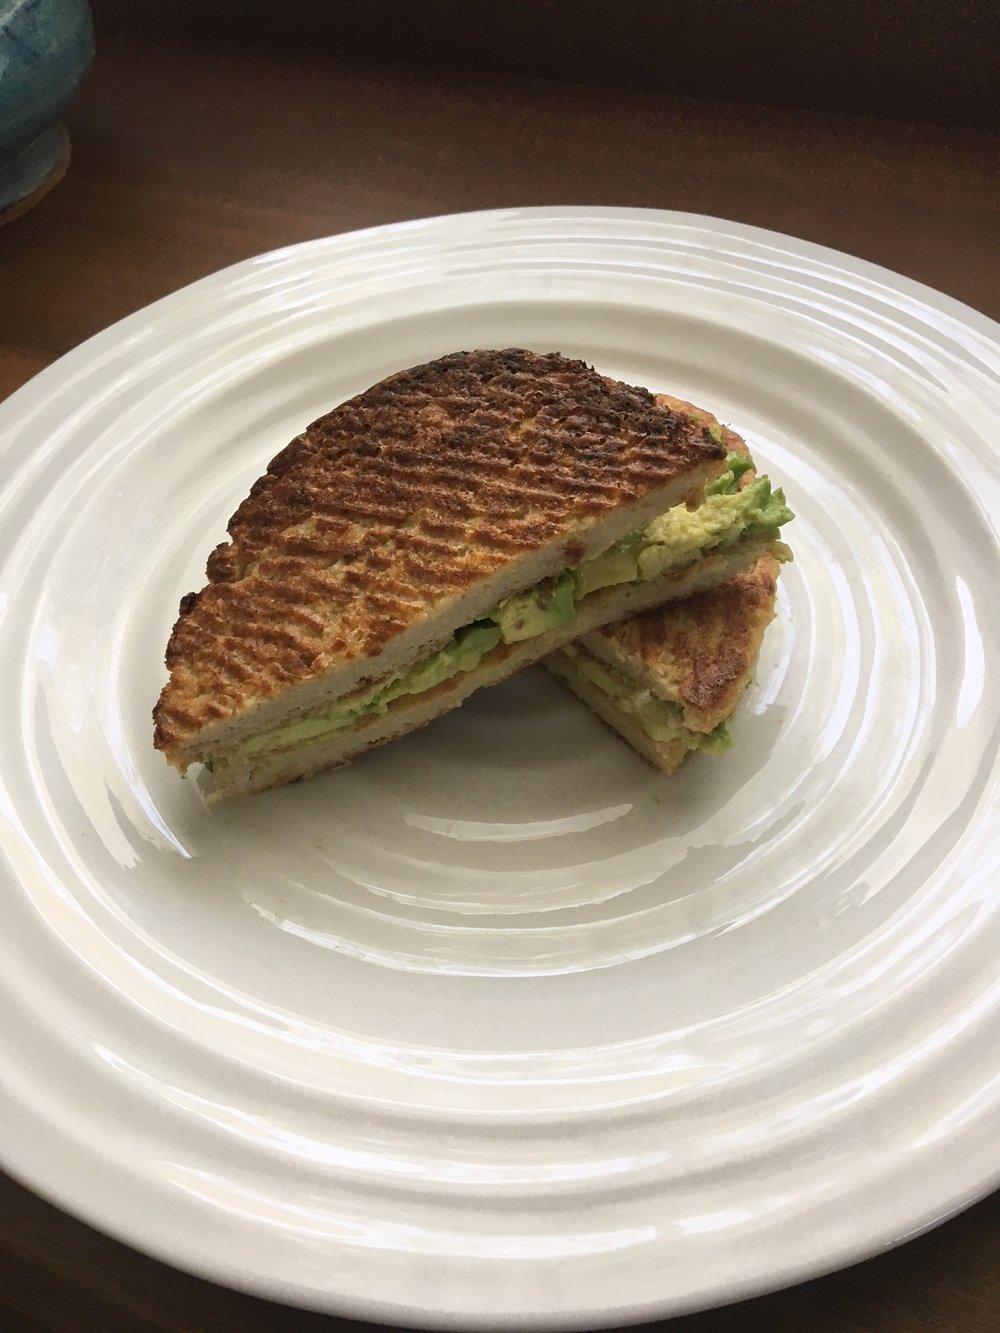 "Smashed avocado cauliflower ""grilled cheese"" sandwich."